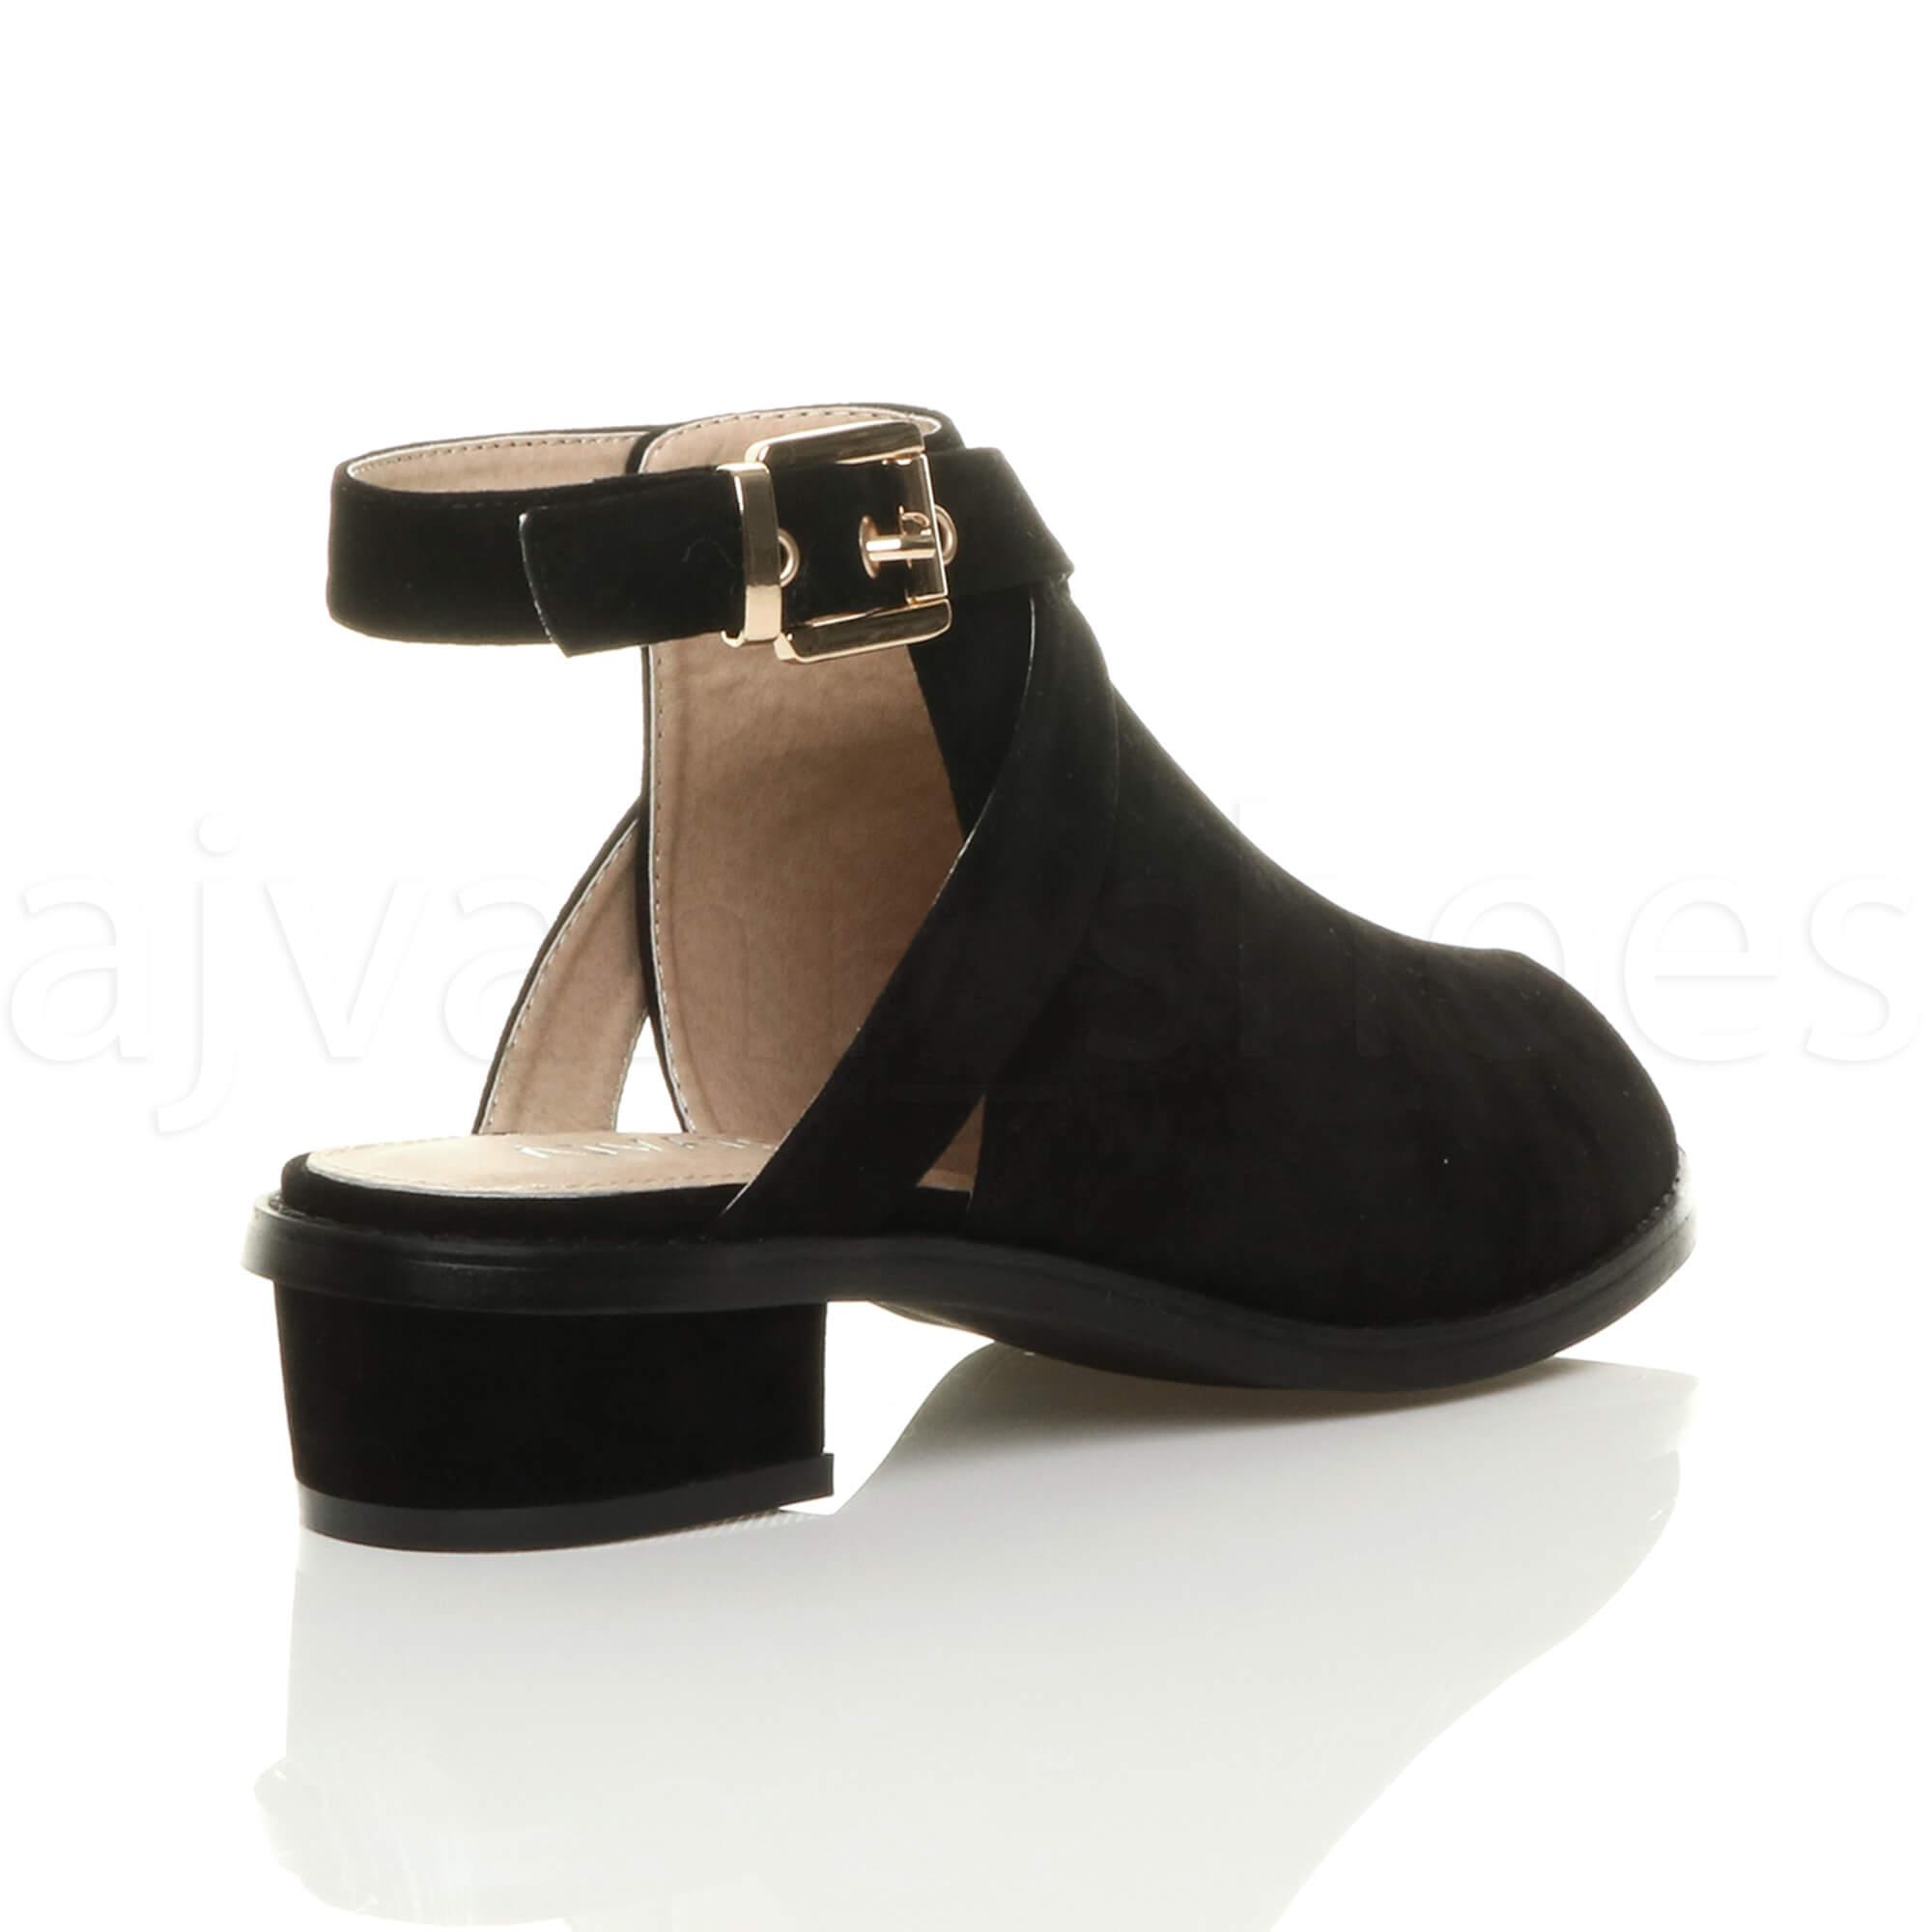 Femmes bas mi talon bloc peep toe boucle bottines chaussures sandales pointure | eBay